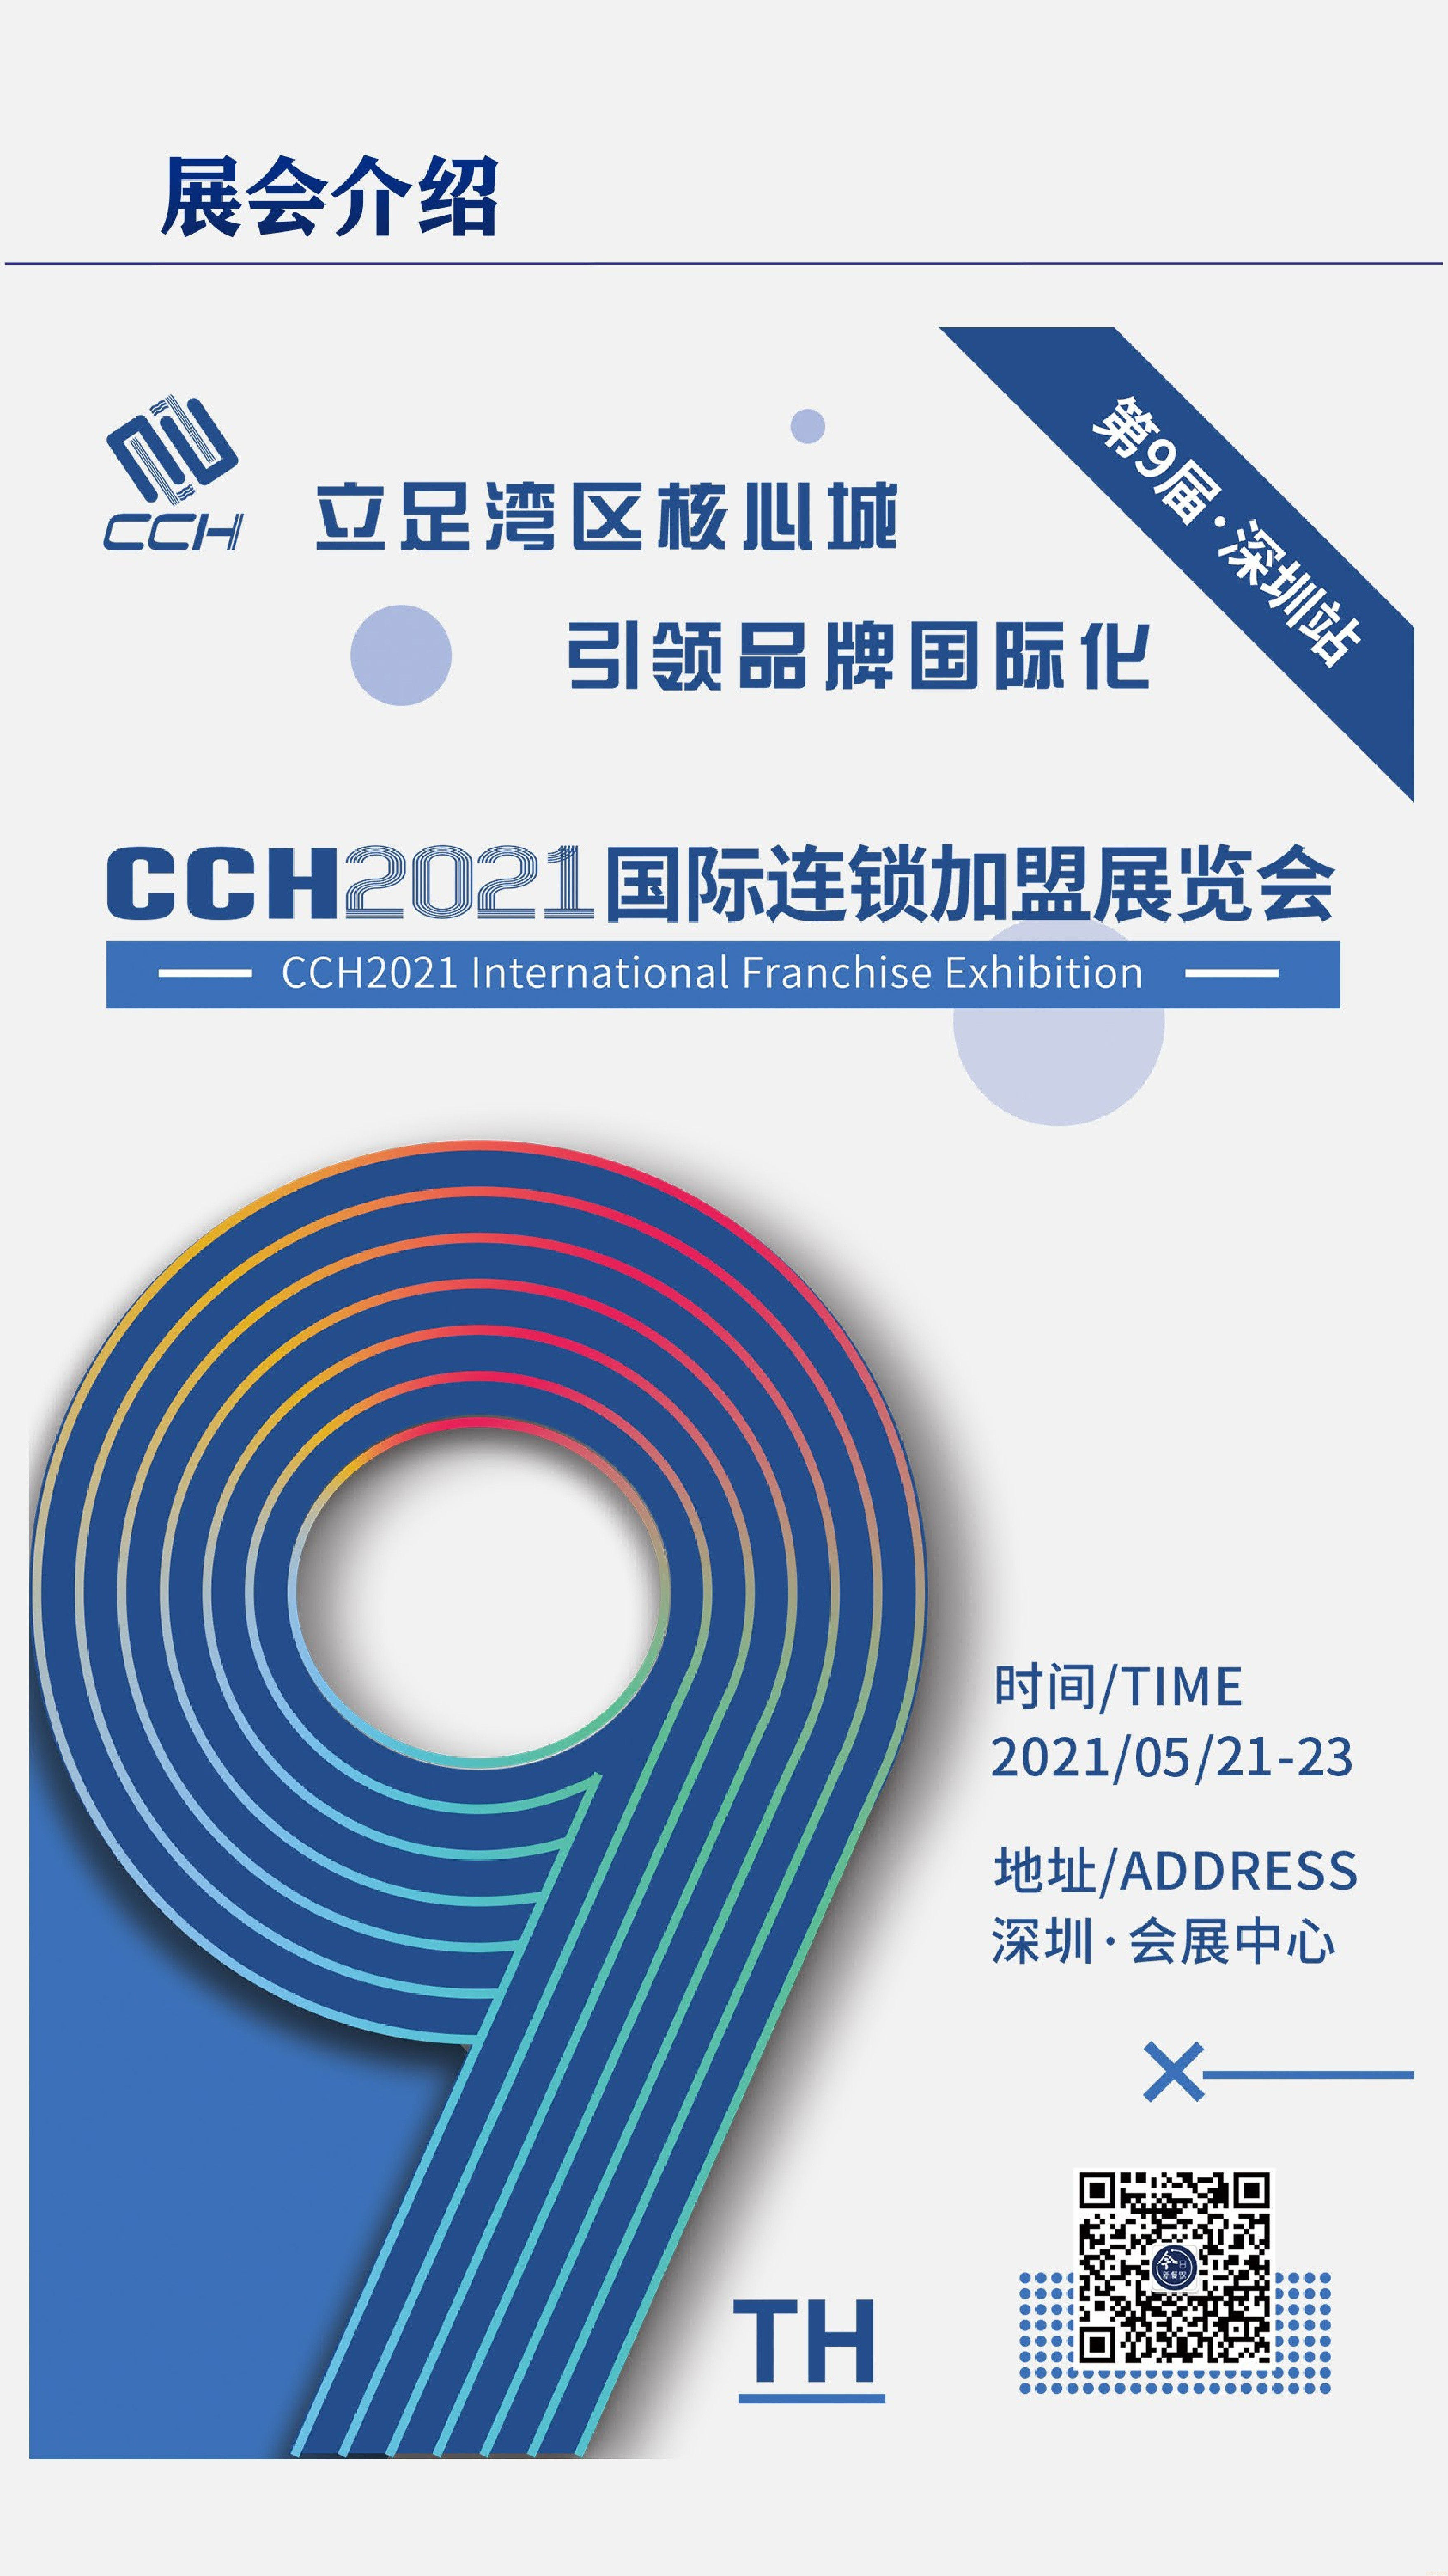 CCH2021-餐饮邀请函·赵(2)(1)-004.jpg